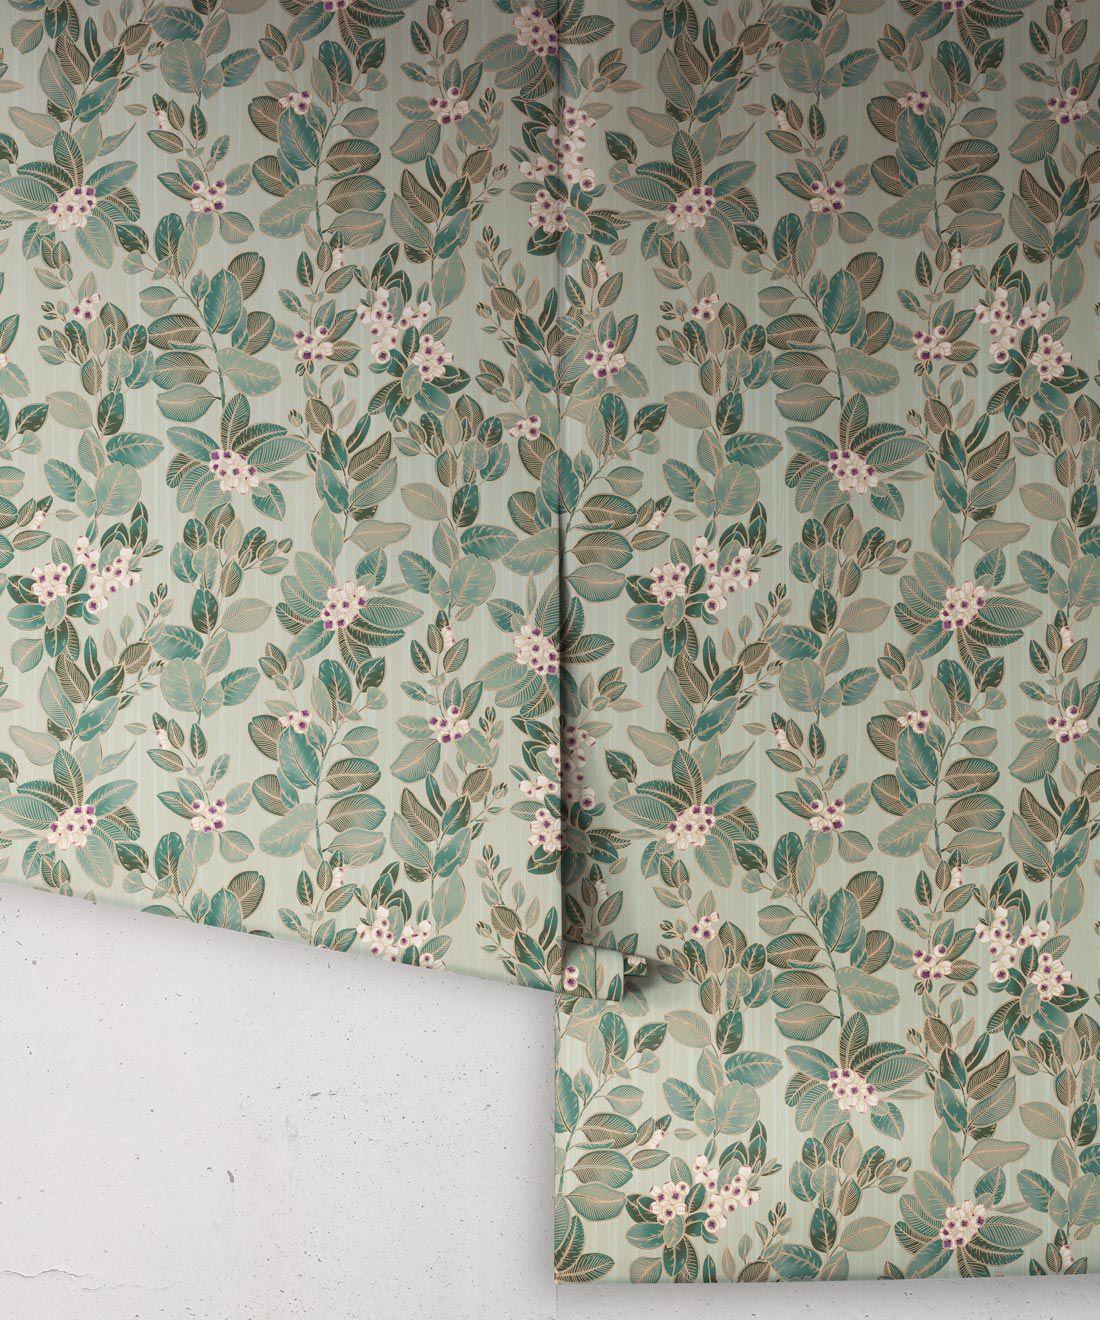 Eucalyptus Wallpaper • Eloise Short • Vintage Floral Wallpaper •Granny Chic Wallpaper • Grandmillennial Style Wallpaper •Pale Green •Rolls